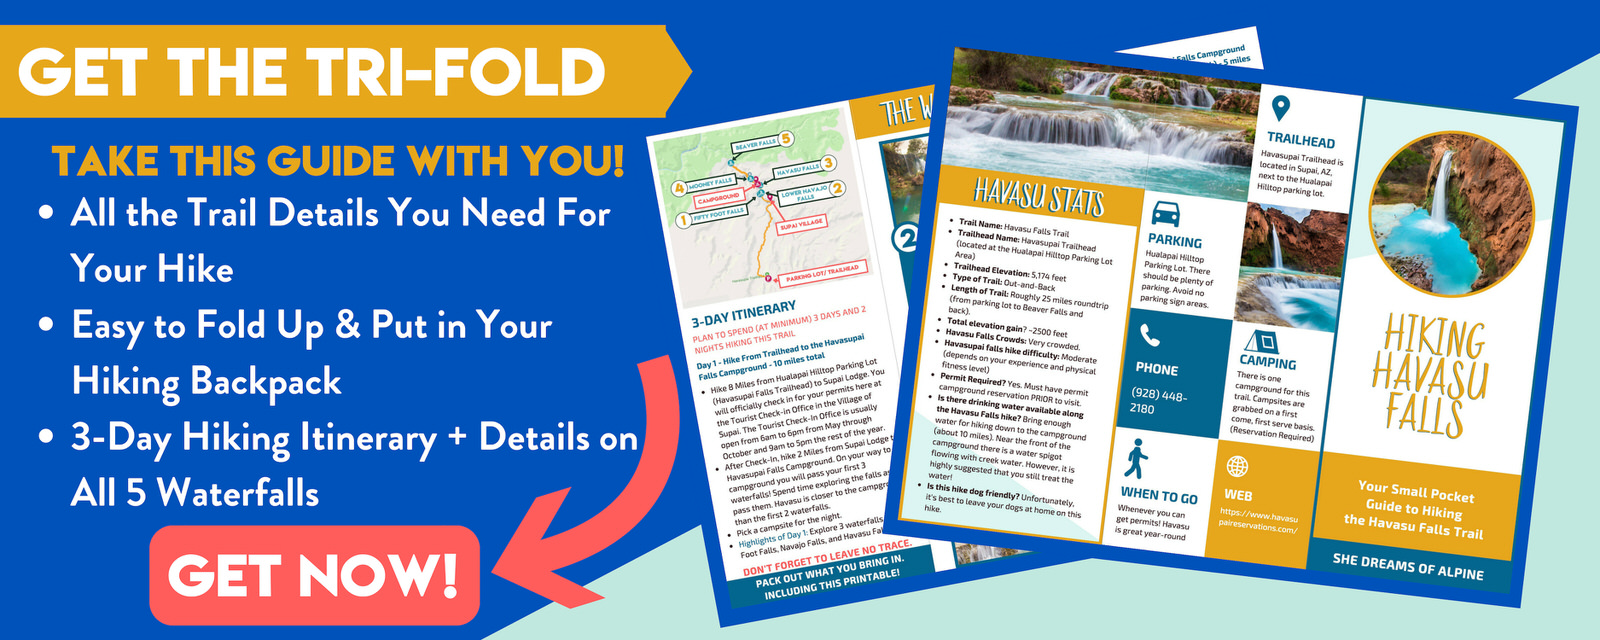 havasu-falls-trifold-guide.jpg